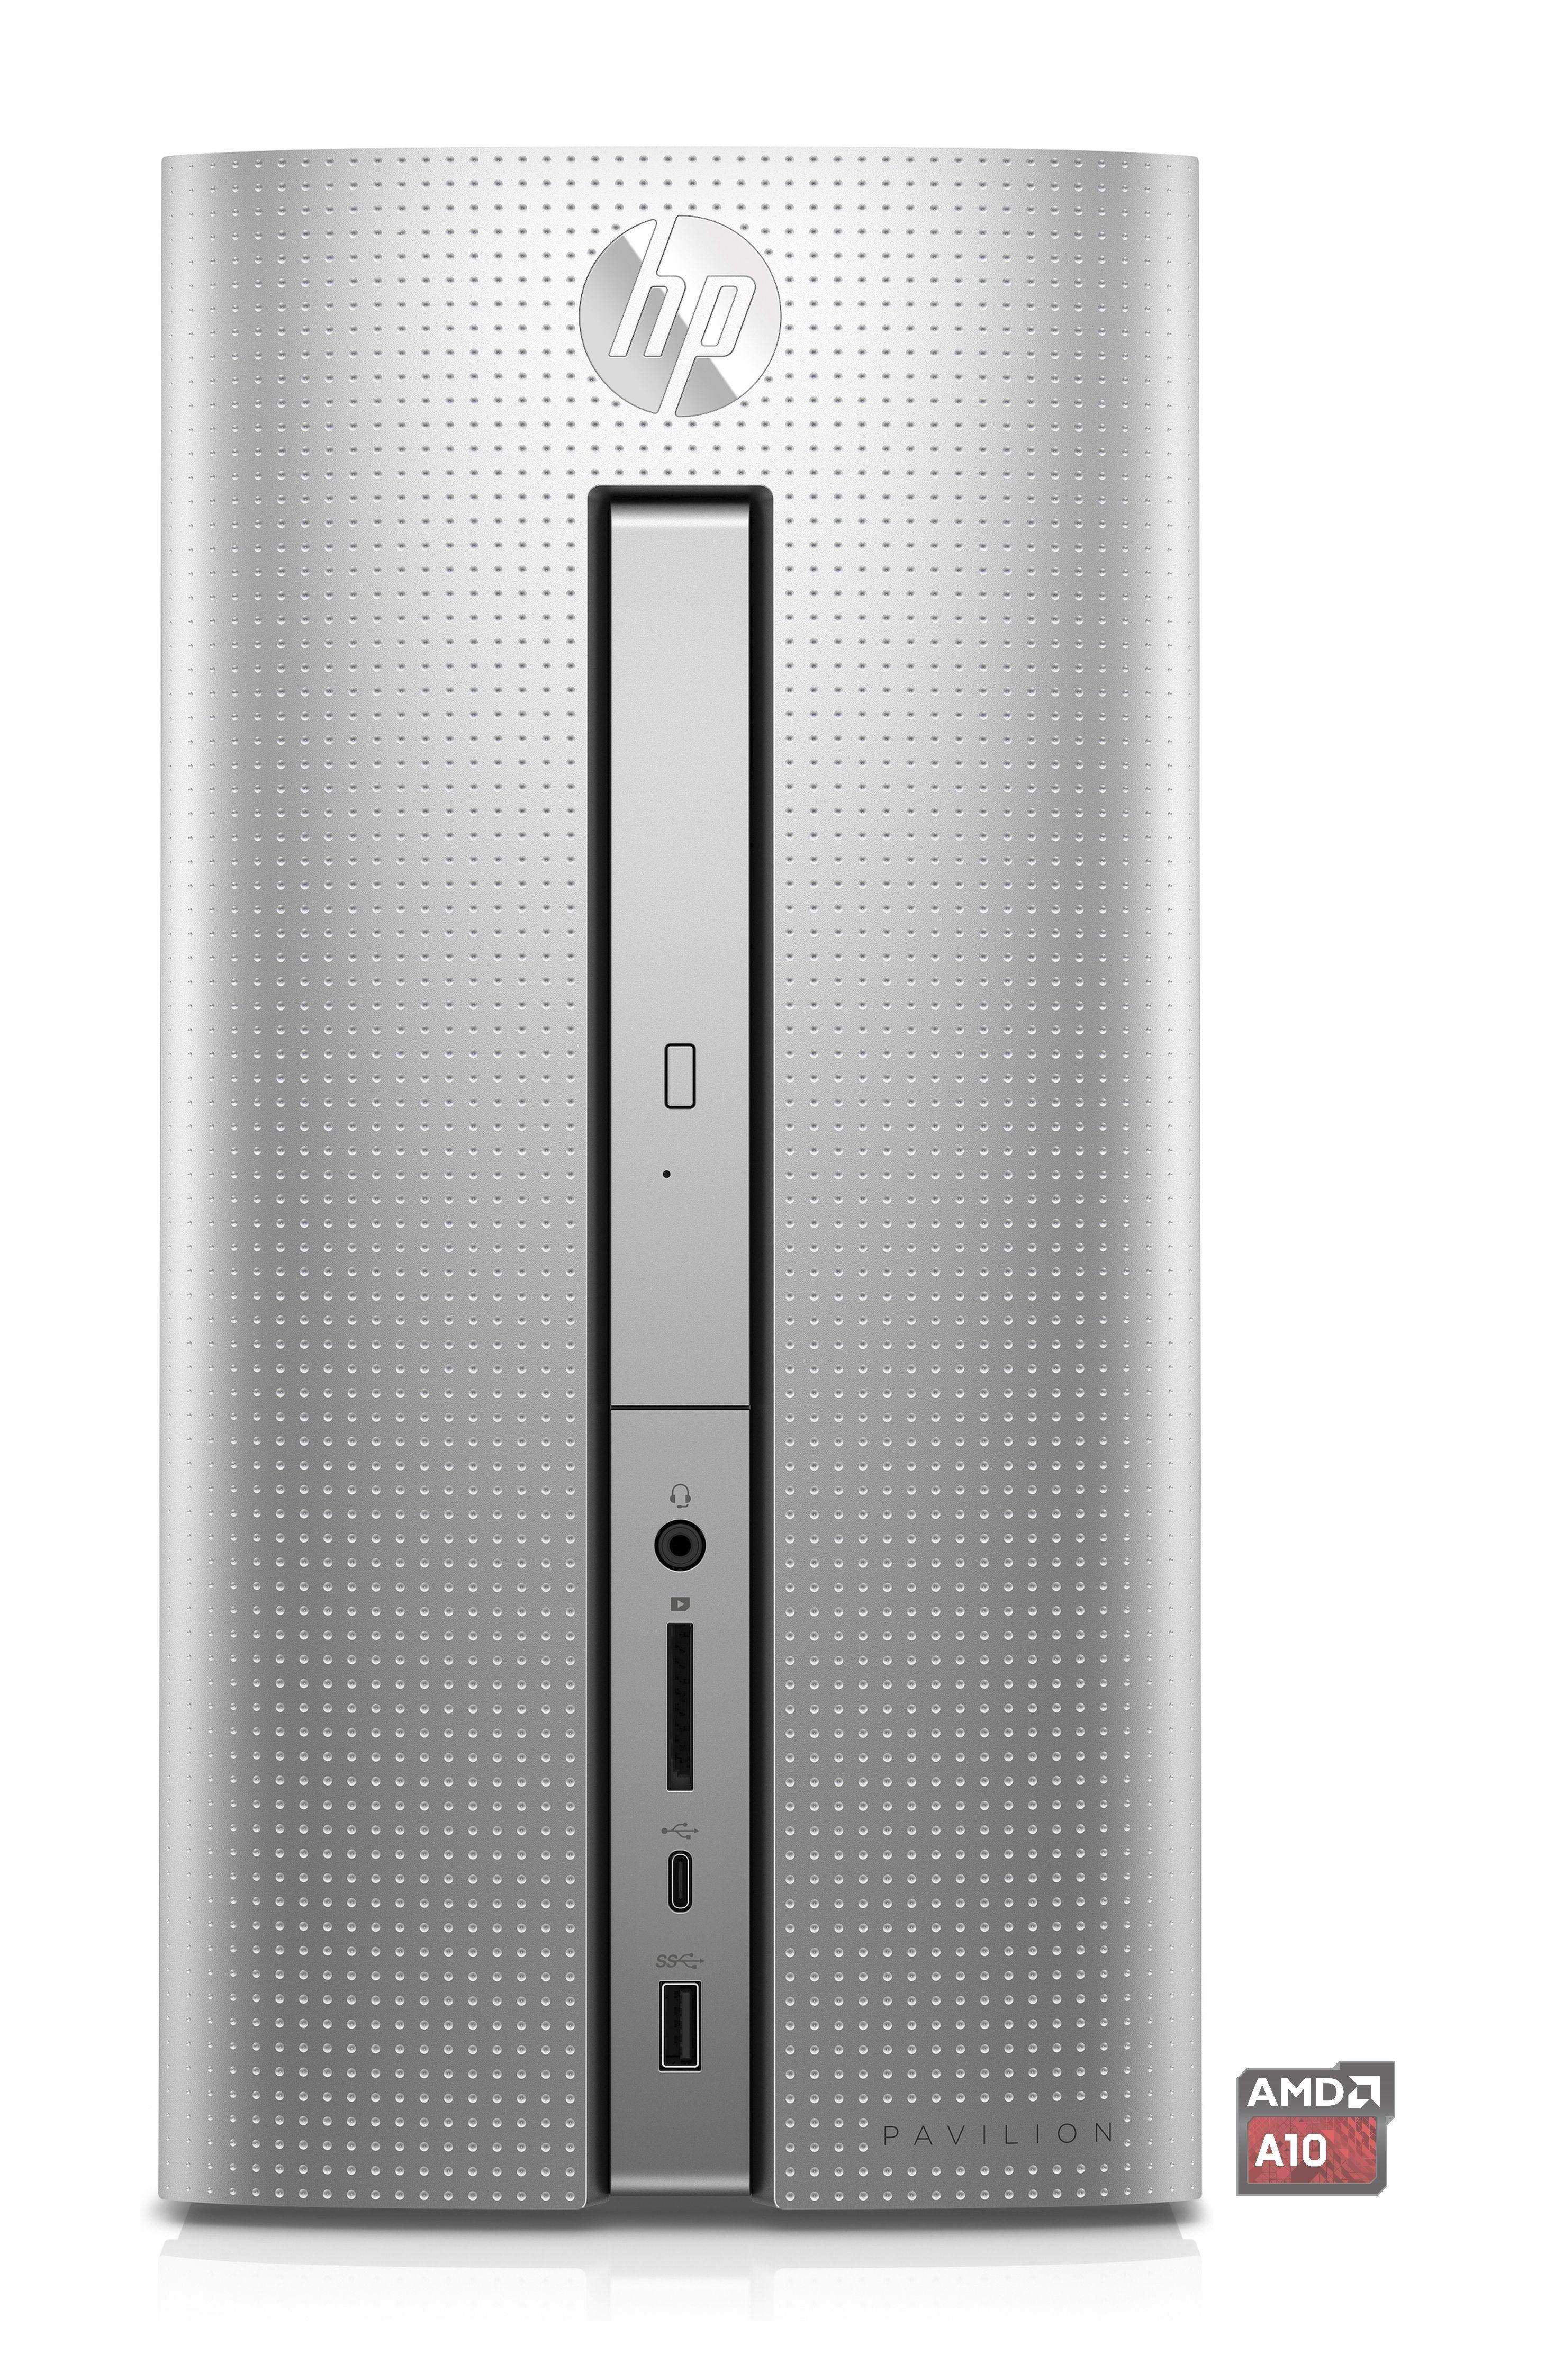 HP Pavilion Desktop 570-p063ng »Quad Core A10-9700, R7, 128 GB + 1 TB HHD, 8 GB«